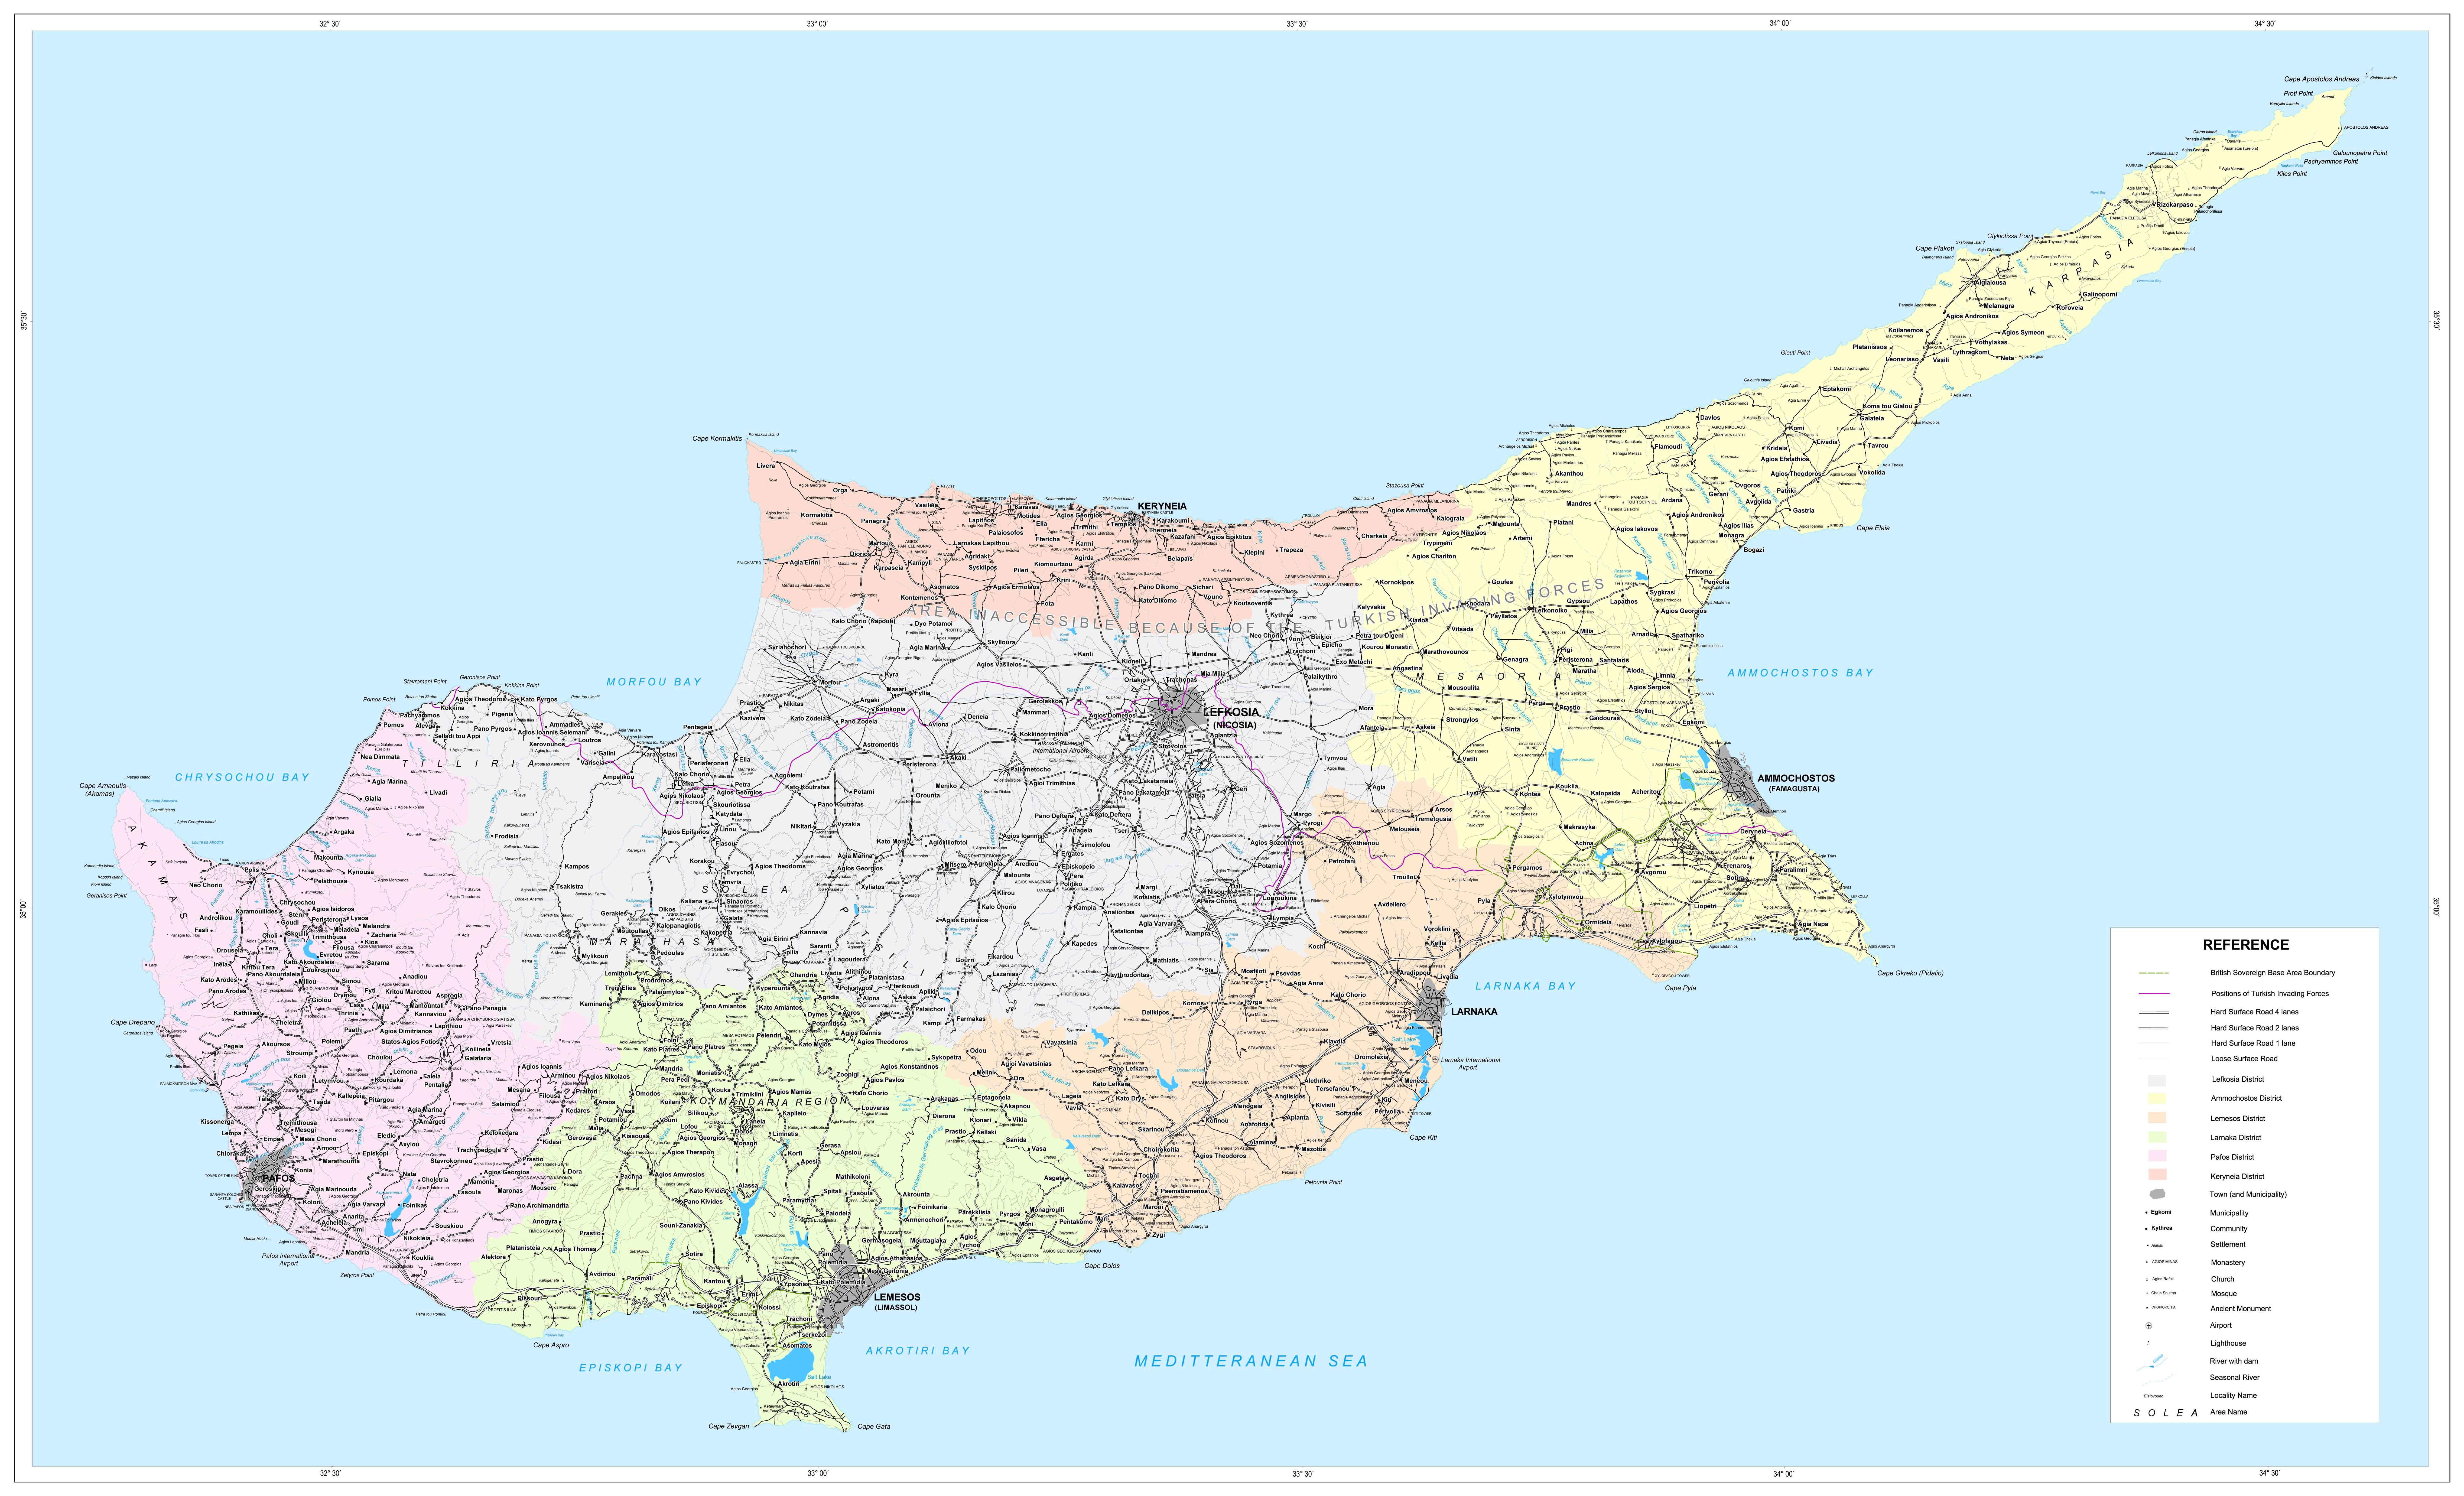 ciprus térkép Ciprus térkép | Cyprus map | Letölthető térkép Ciprusról ciprus térkép